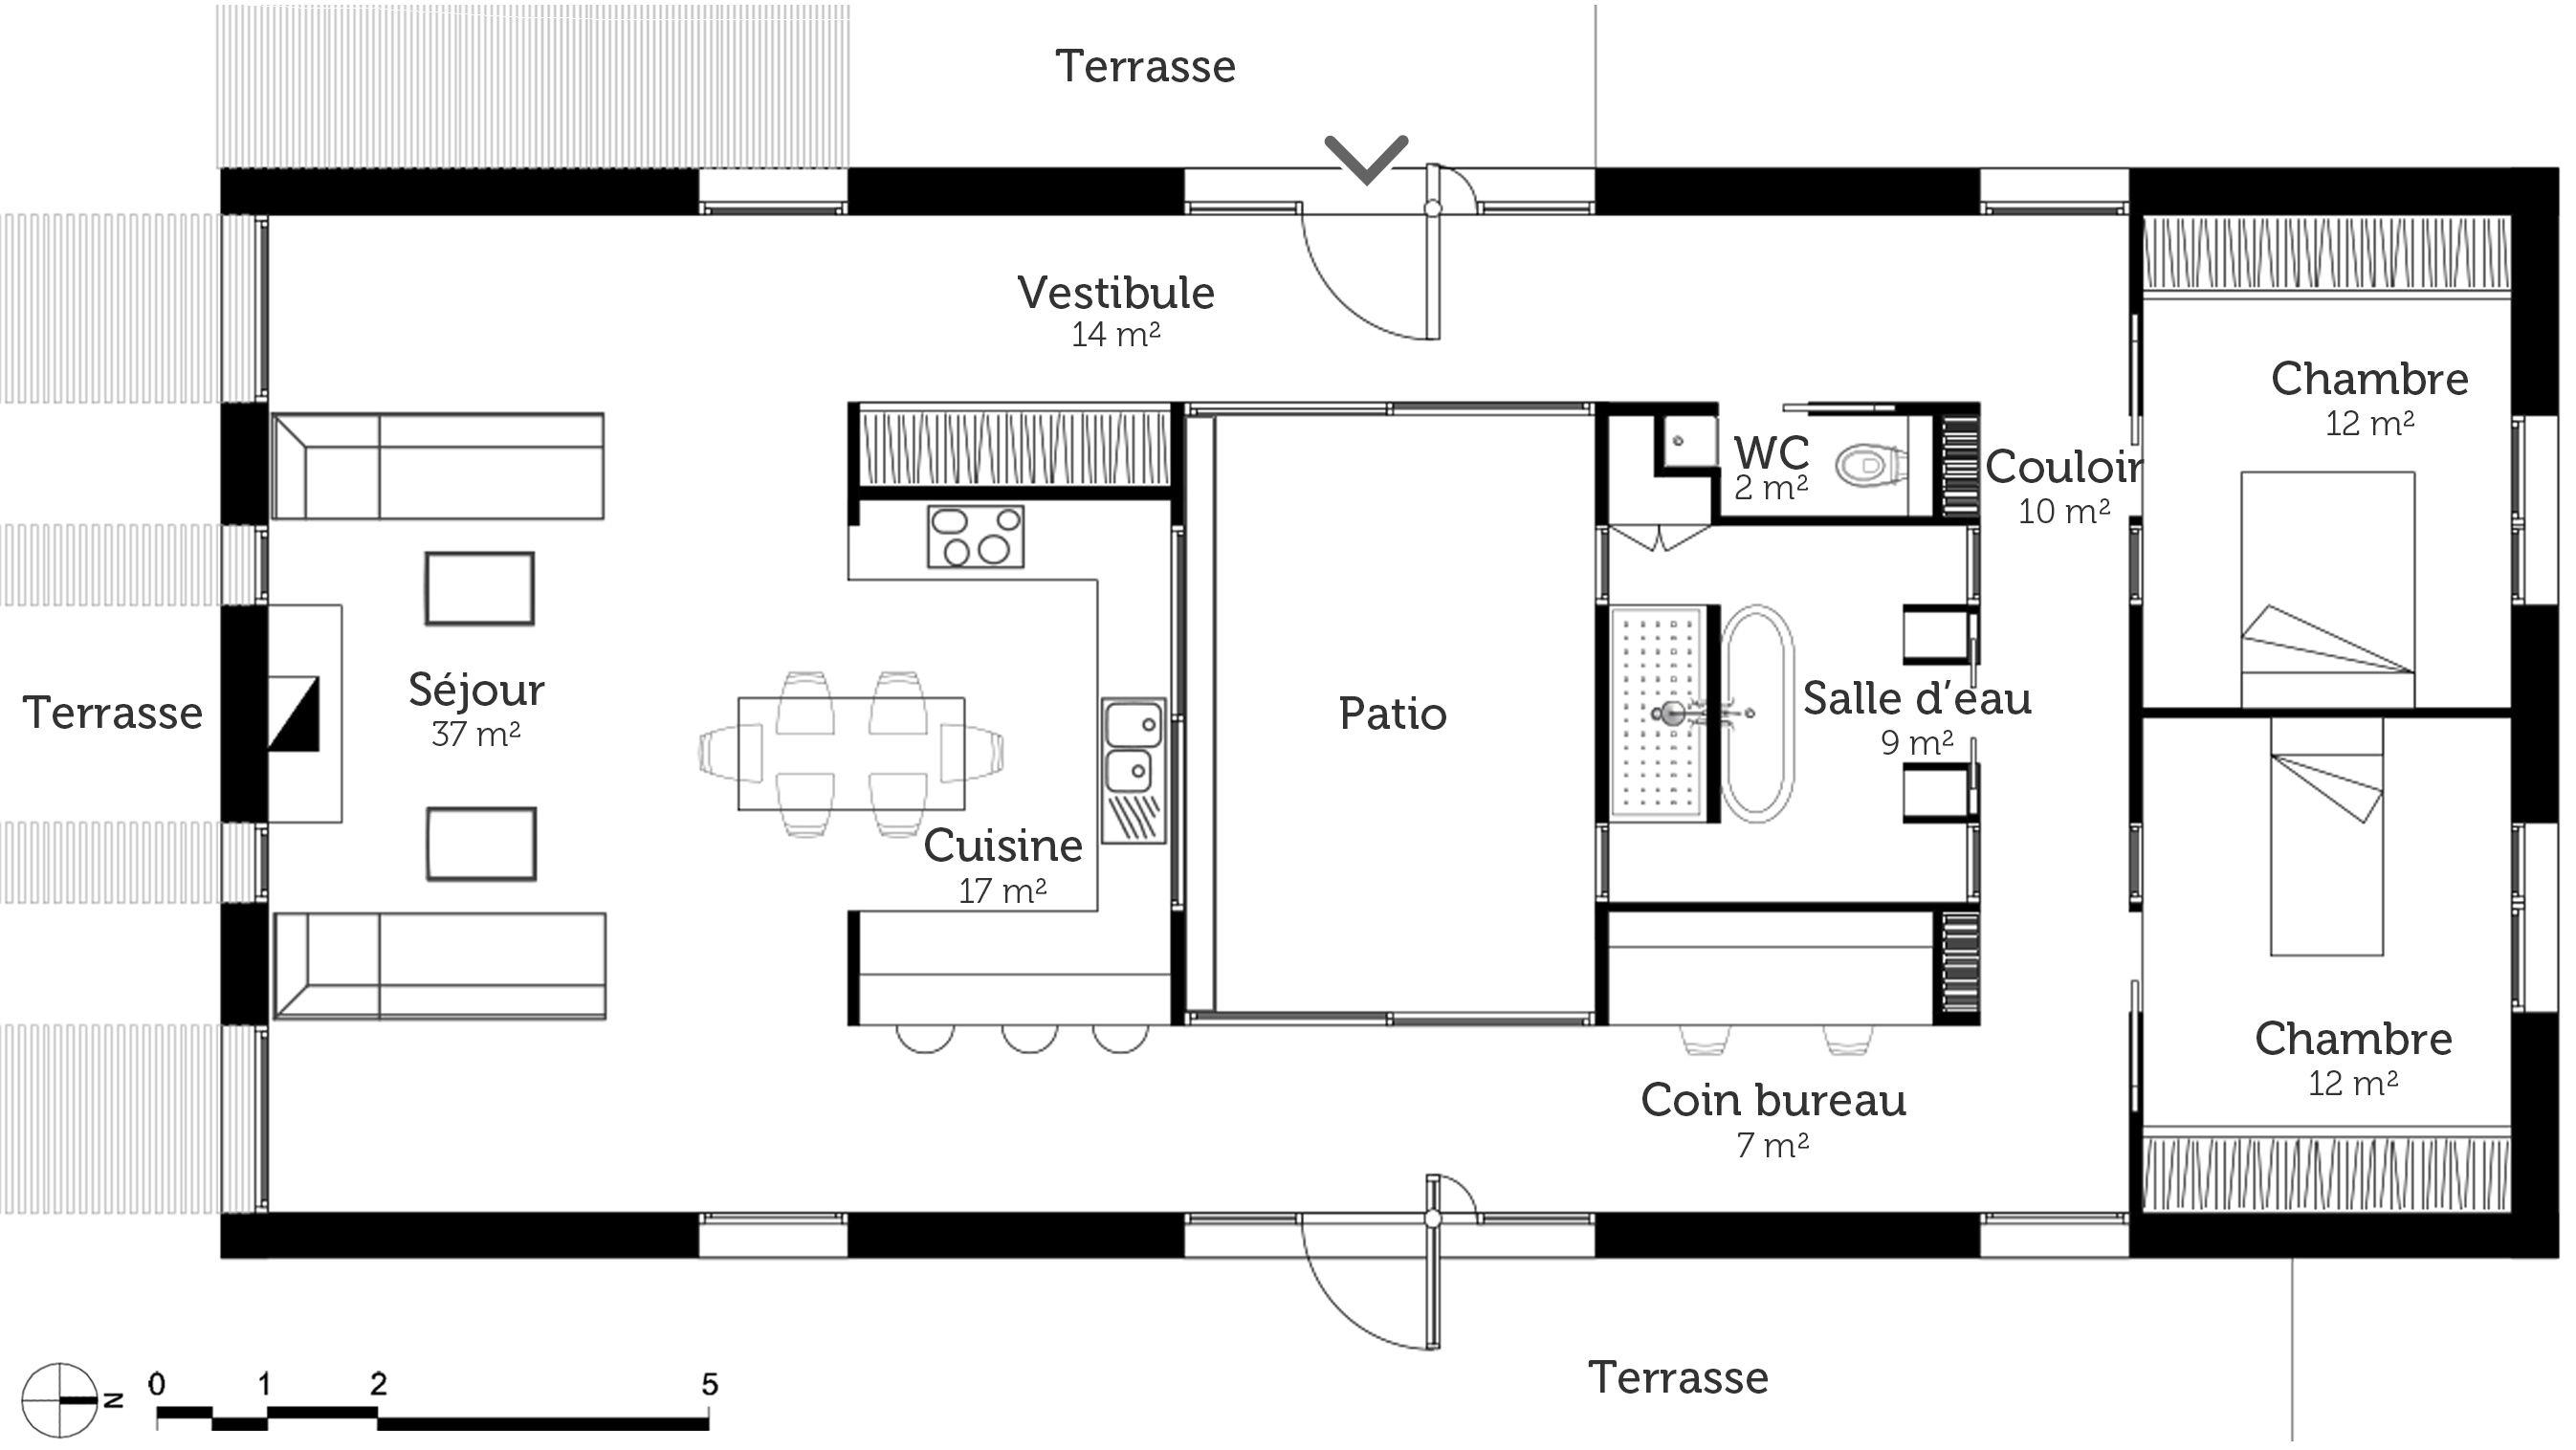 Extrêmement plan-maison-rectangulaire-2-chambres-avec-terrasse.jpg (Image JPEG  JC87